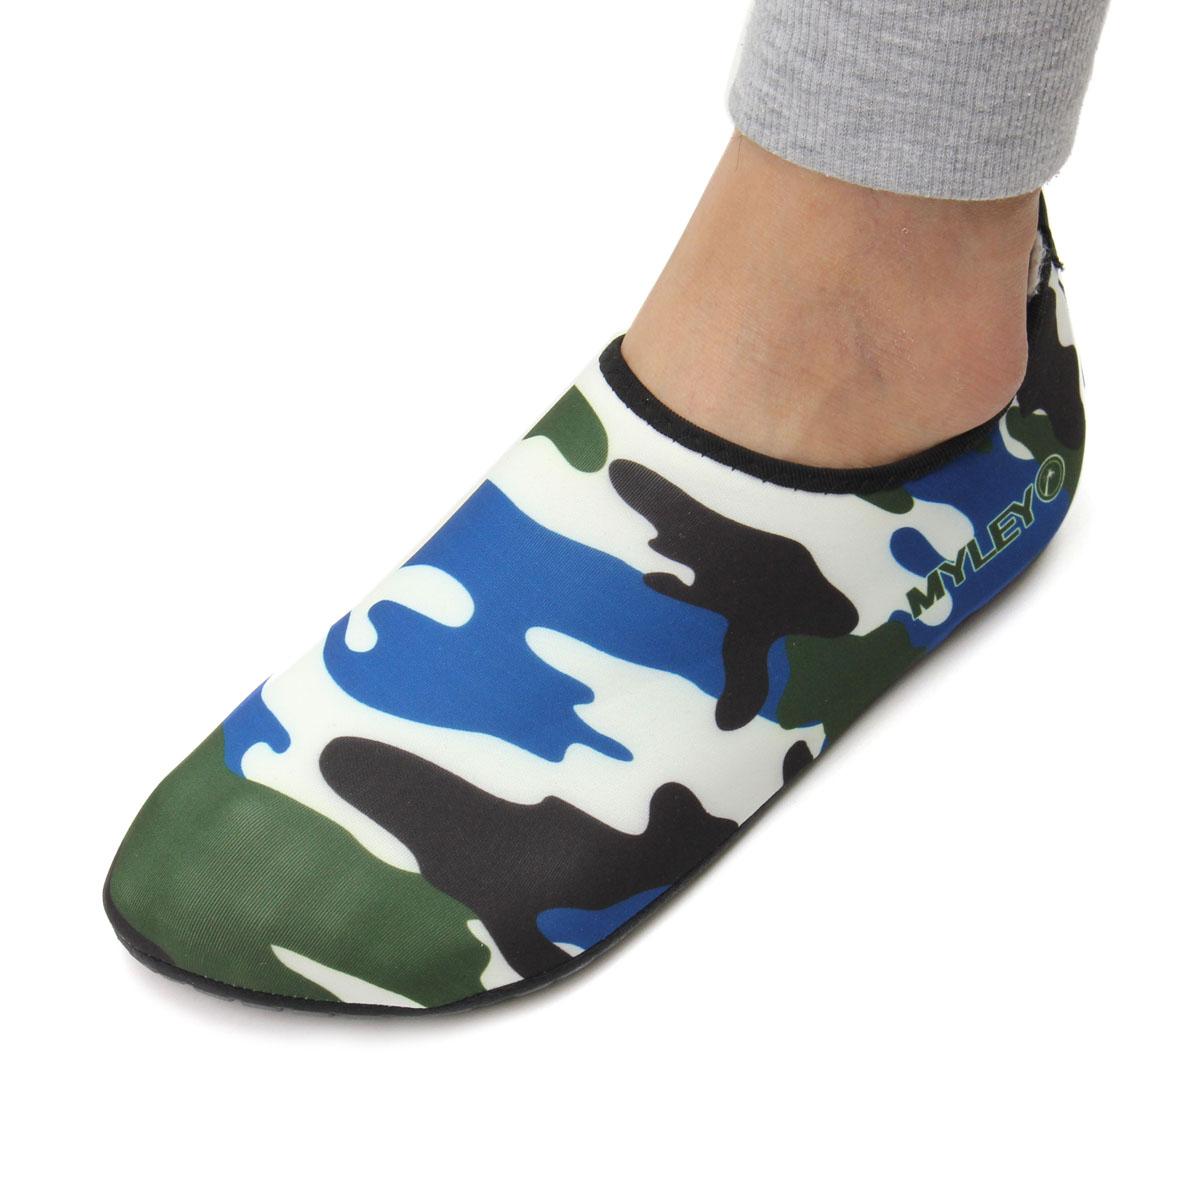 Non Slip Pool Shoes